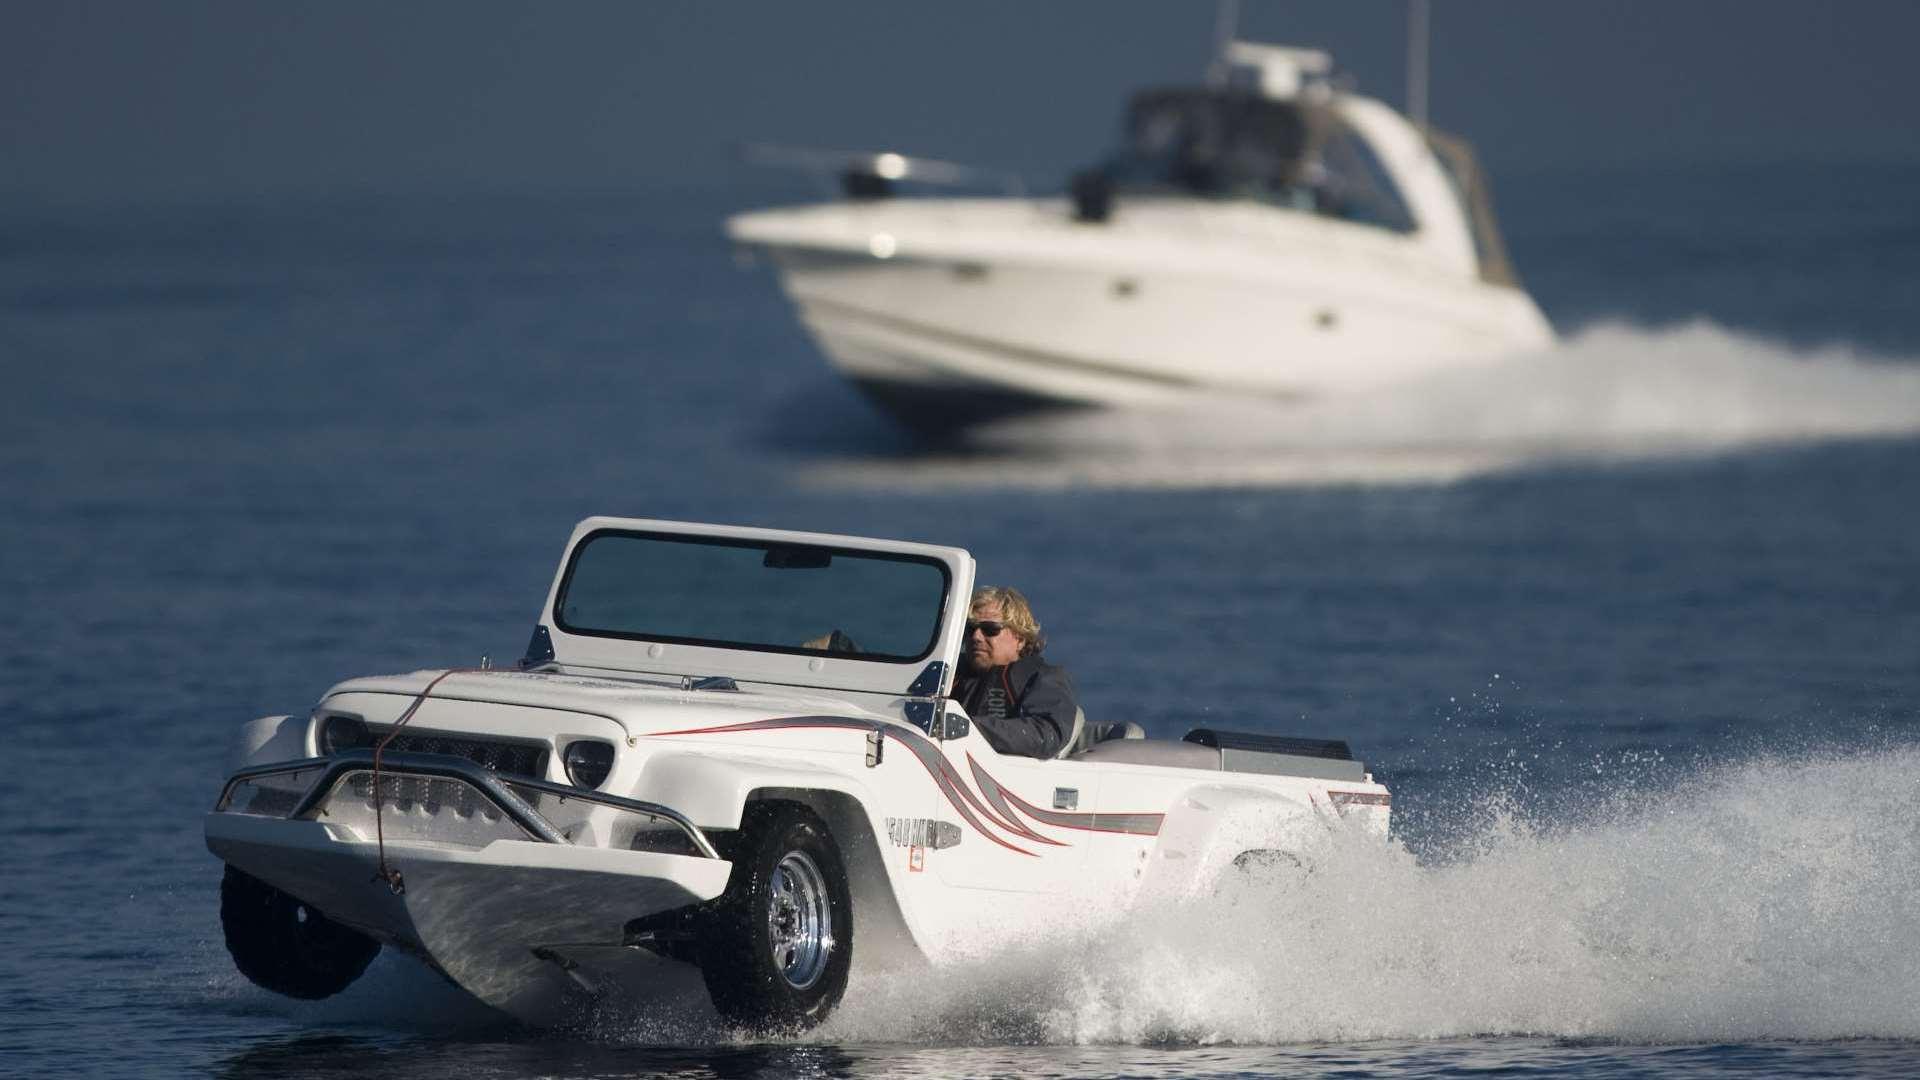 Panther Water Car